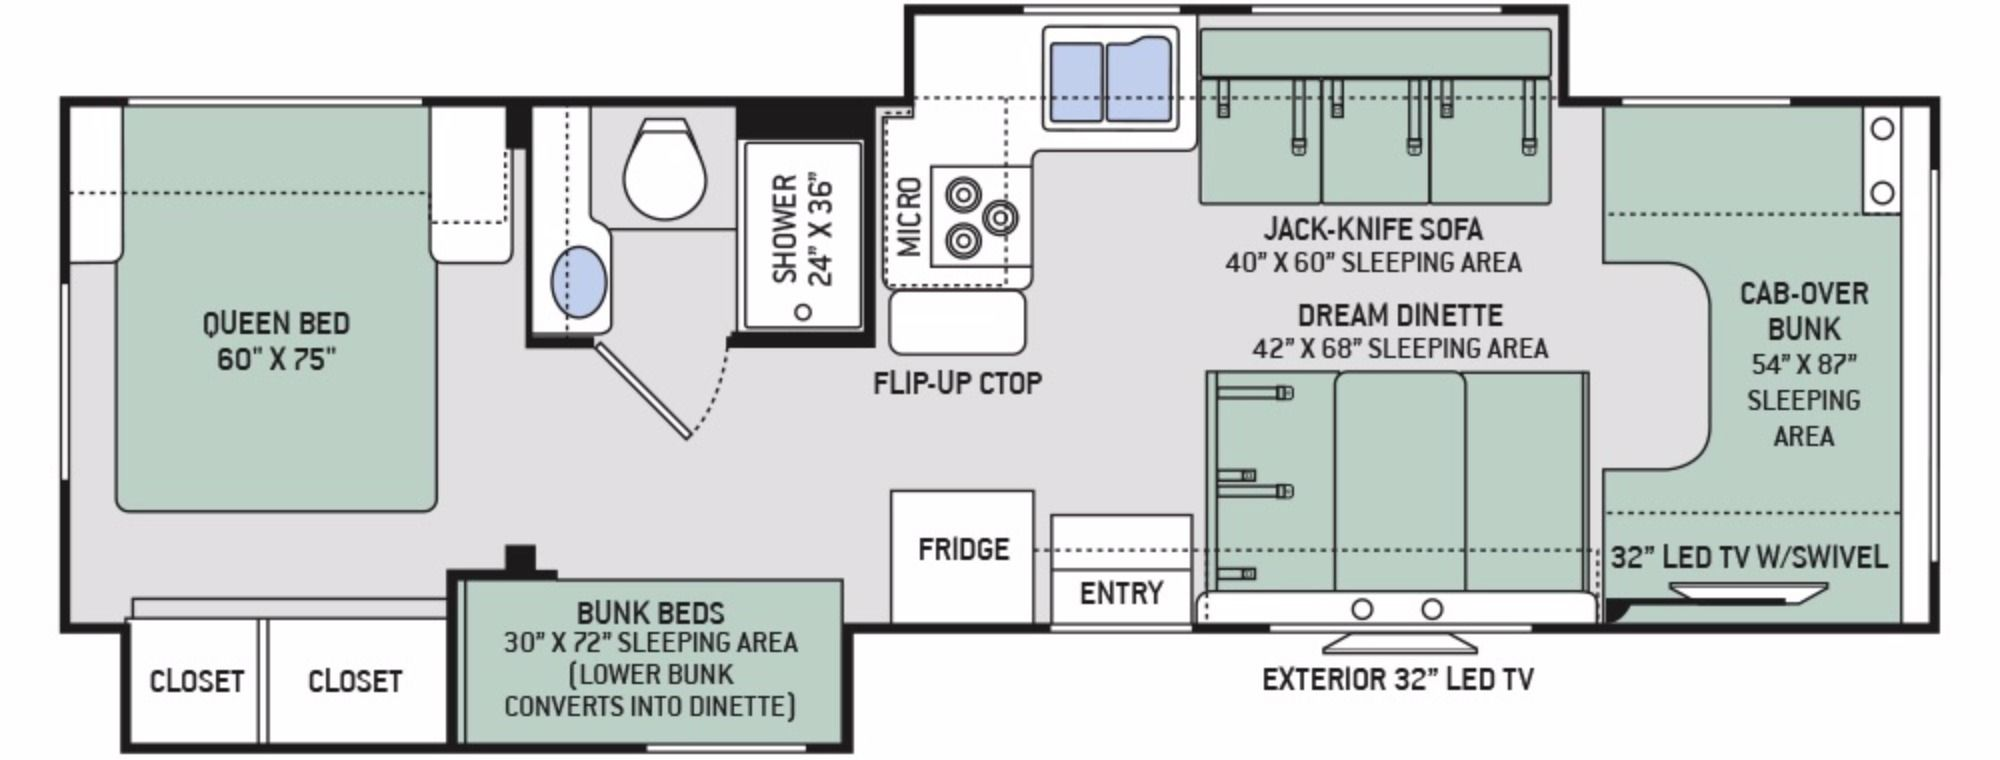 2017 Thor Freedom Elite 30fe Stock 1331054 Floor Plan Rv Floor Plans Floor Plans Class C Motorhomes